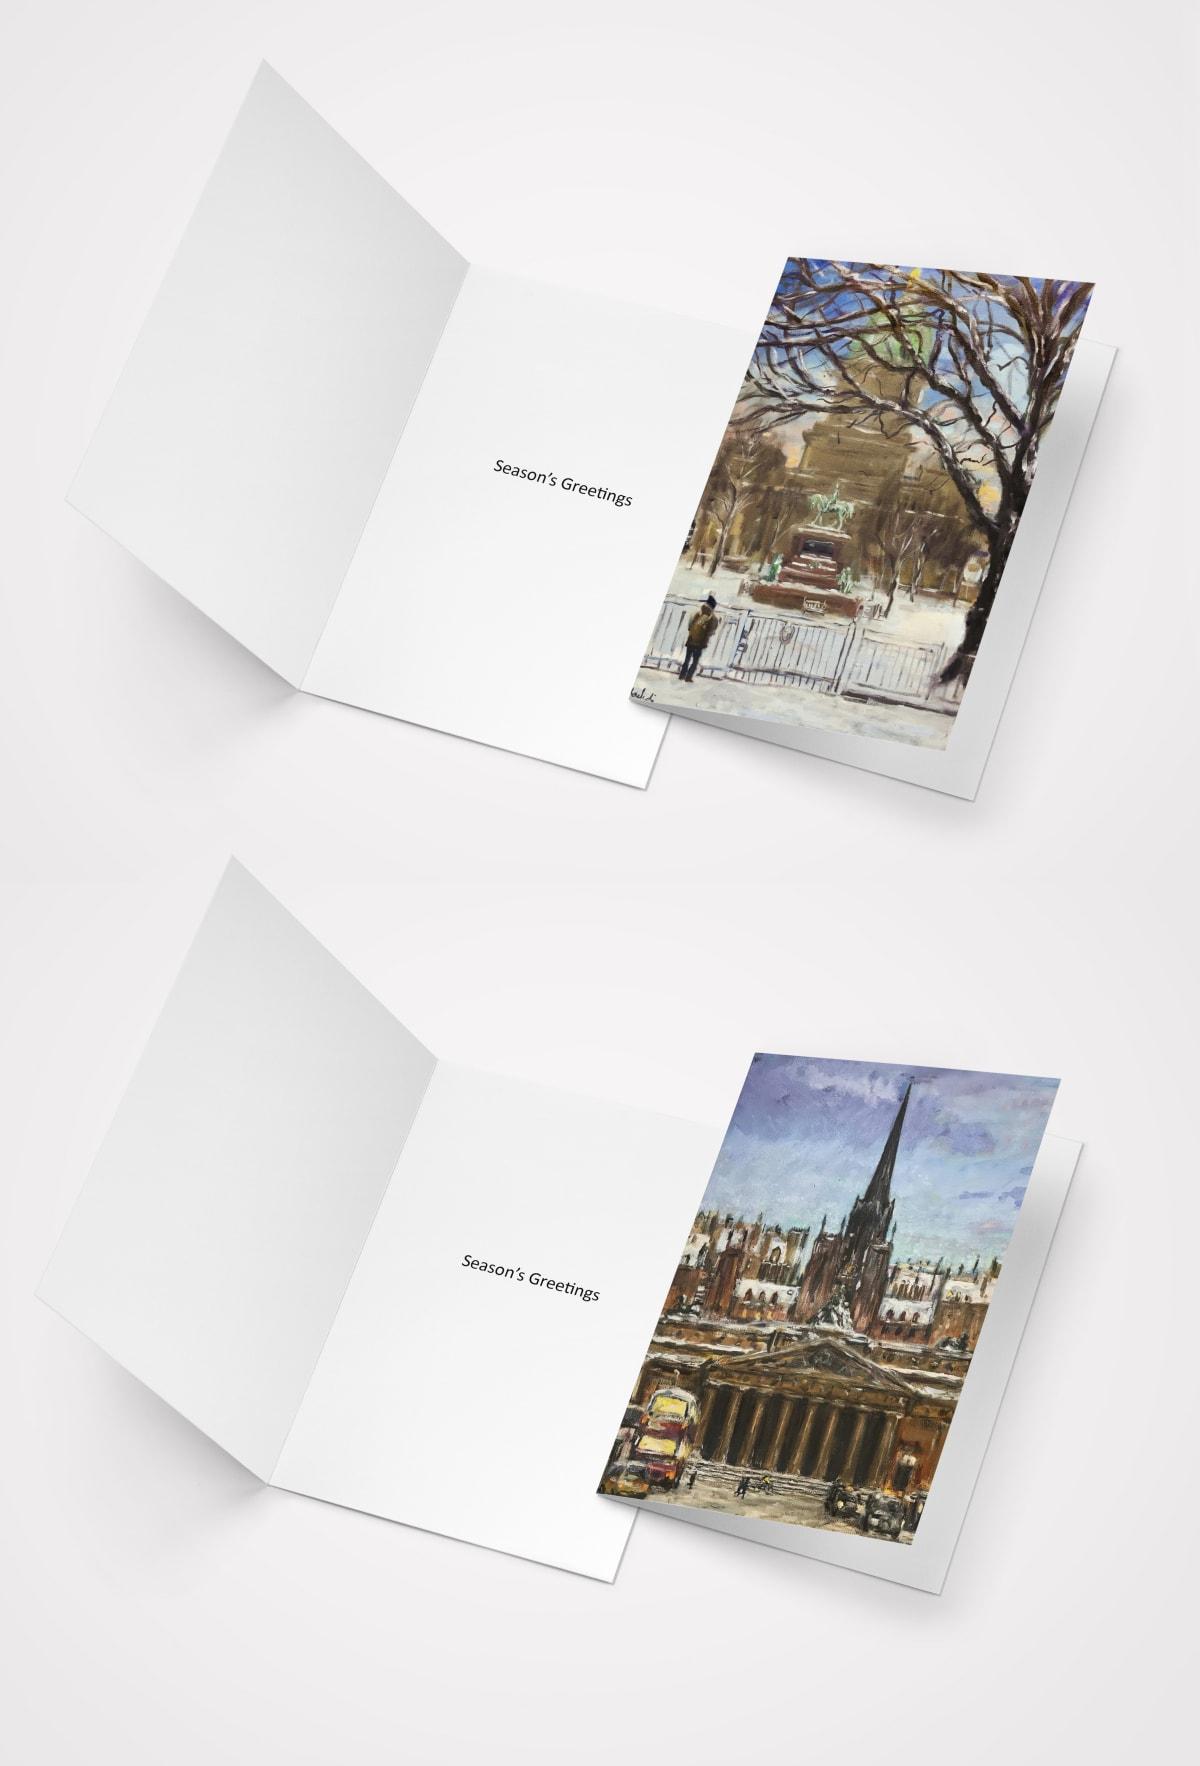 RSA Friends Christmas Cards - Season's Greetings